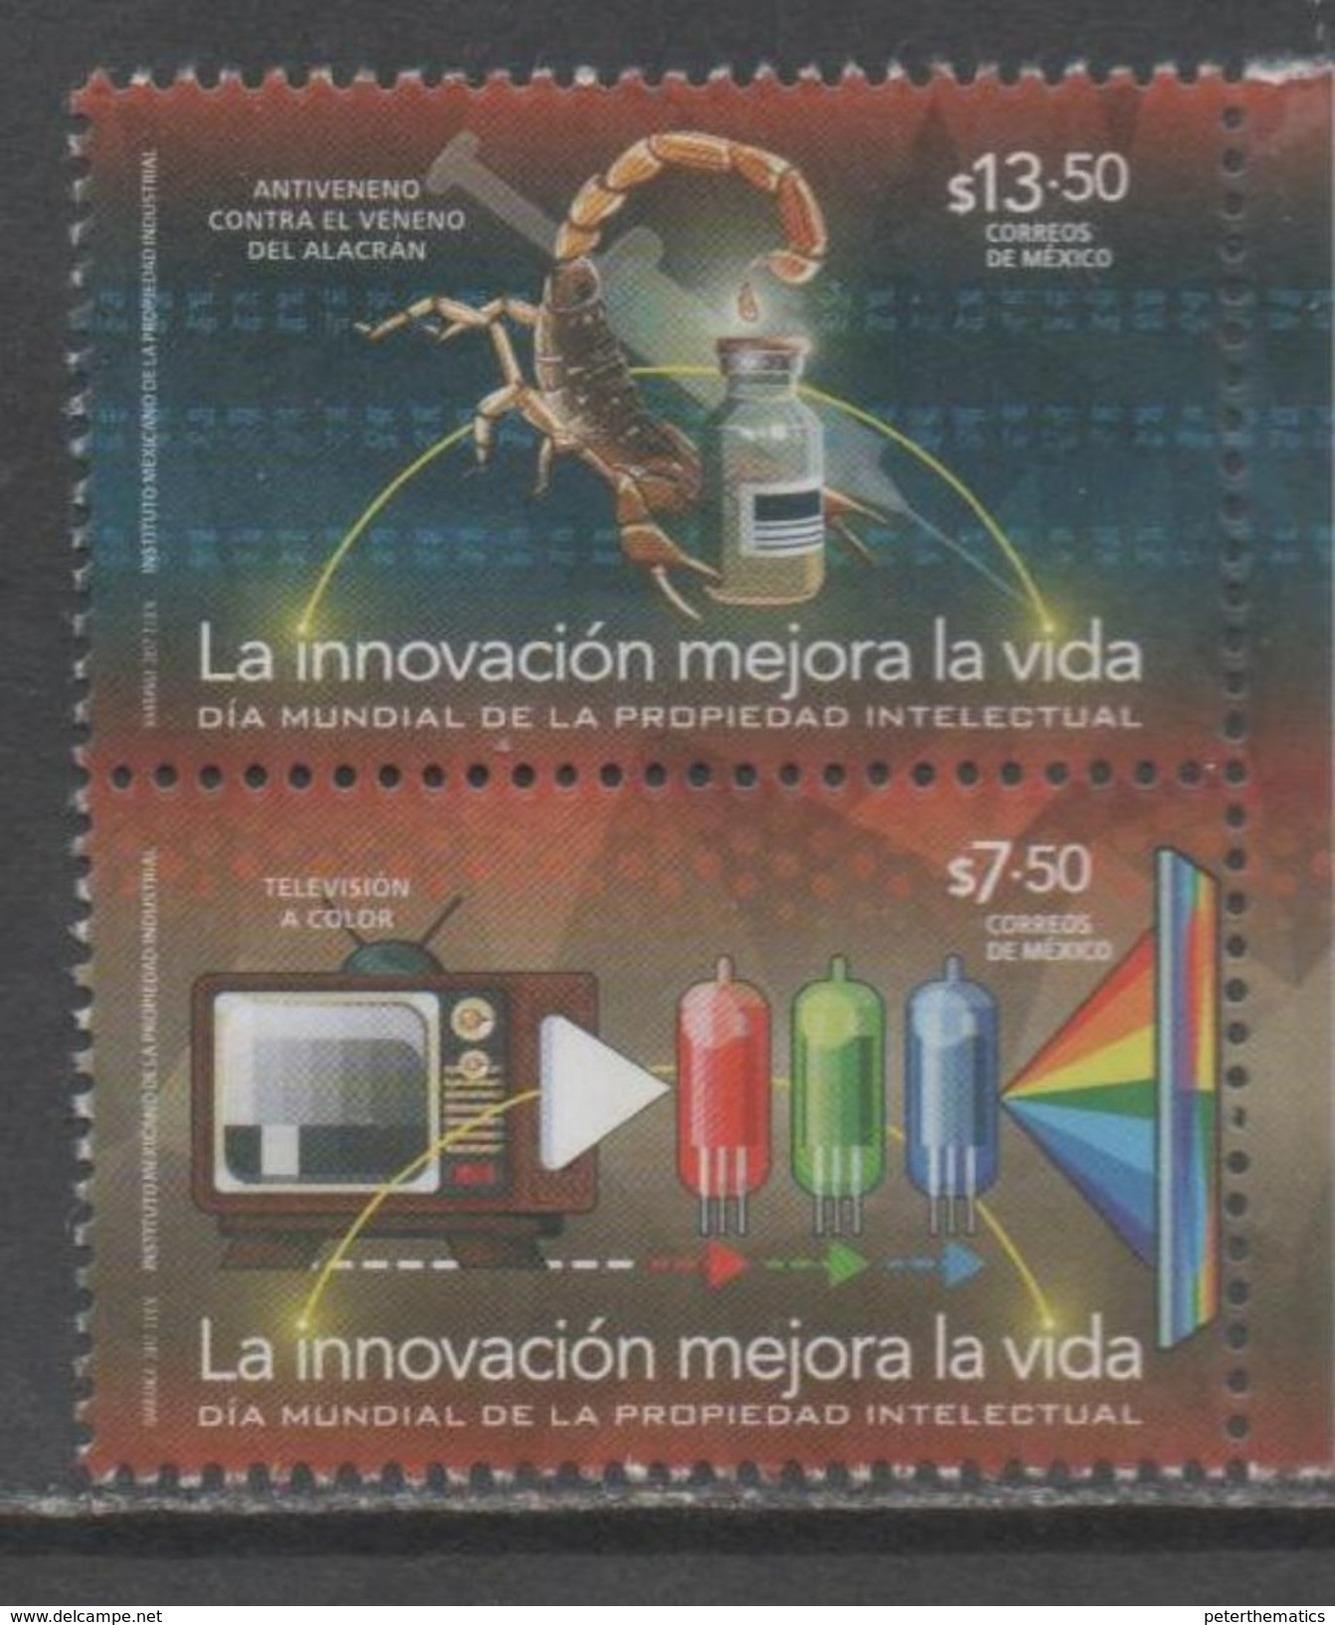 MEXICO  ,2017, MNH, INTELLECTUAL PROPERTY, INNOVATION, SCORPIONS, ANTI-VENOM, TV, 2v - Altri